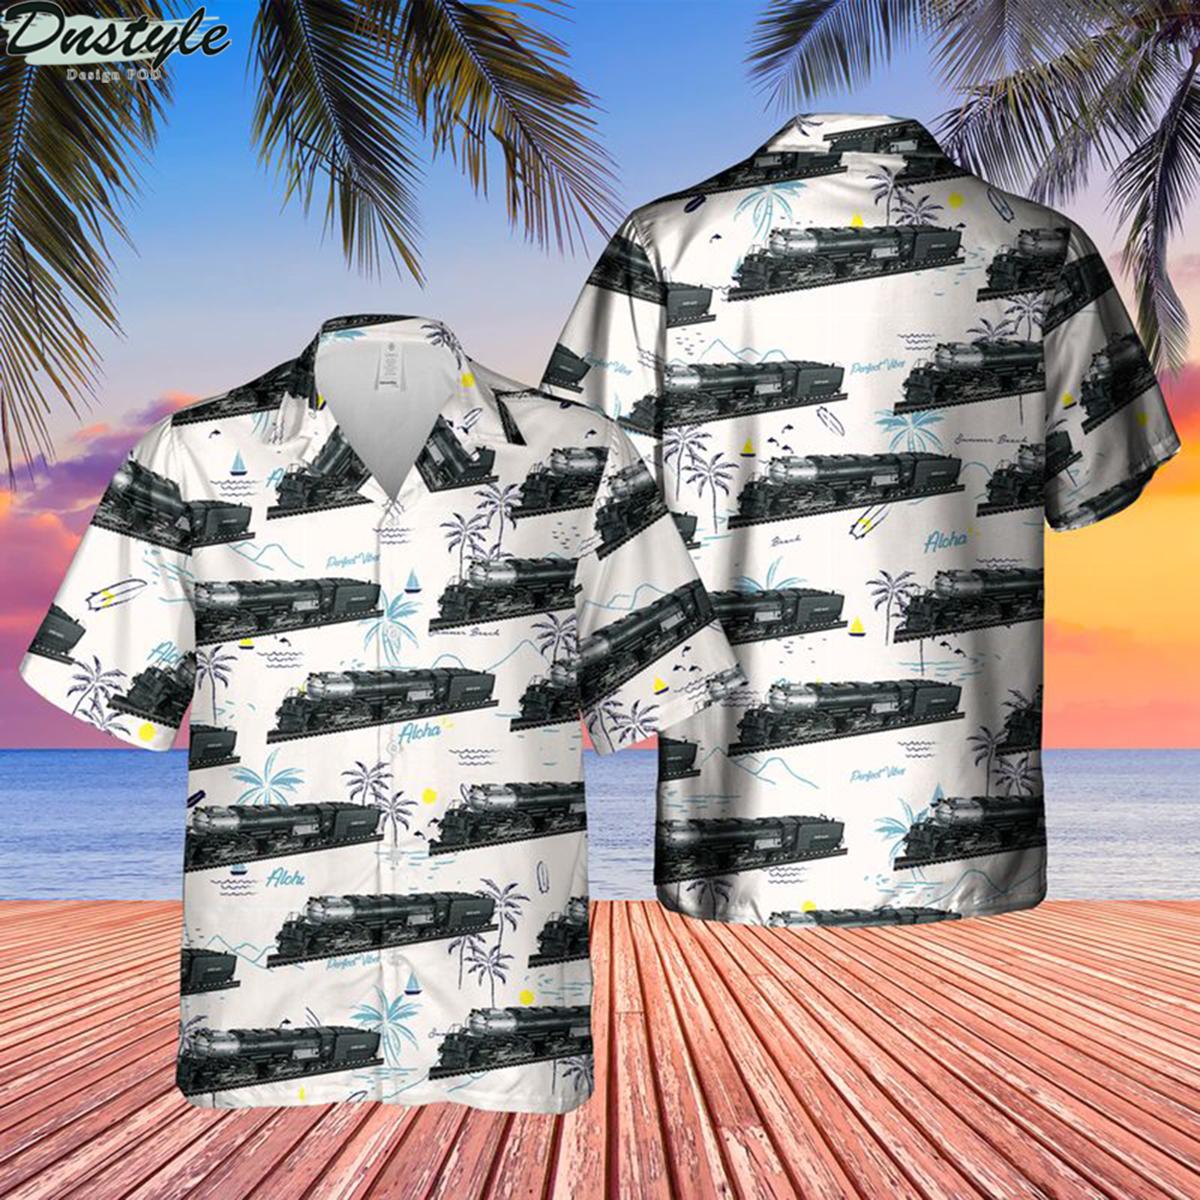 Union pacific railroad big boy no 4014 steam hawaiian shirt 2